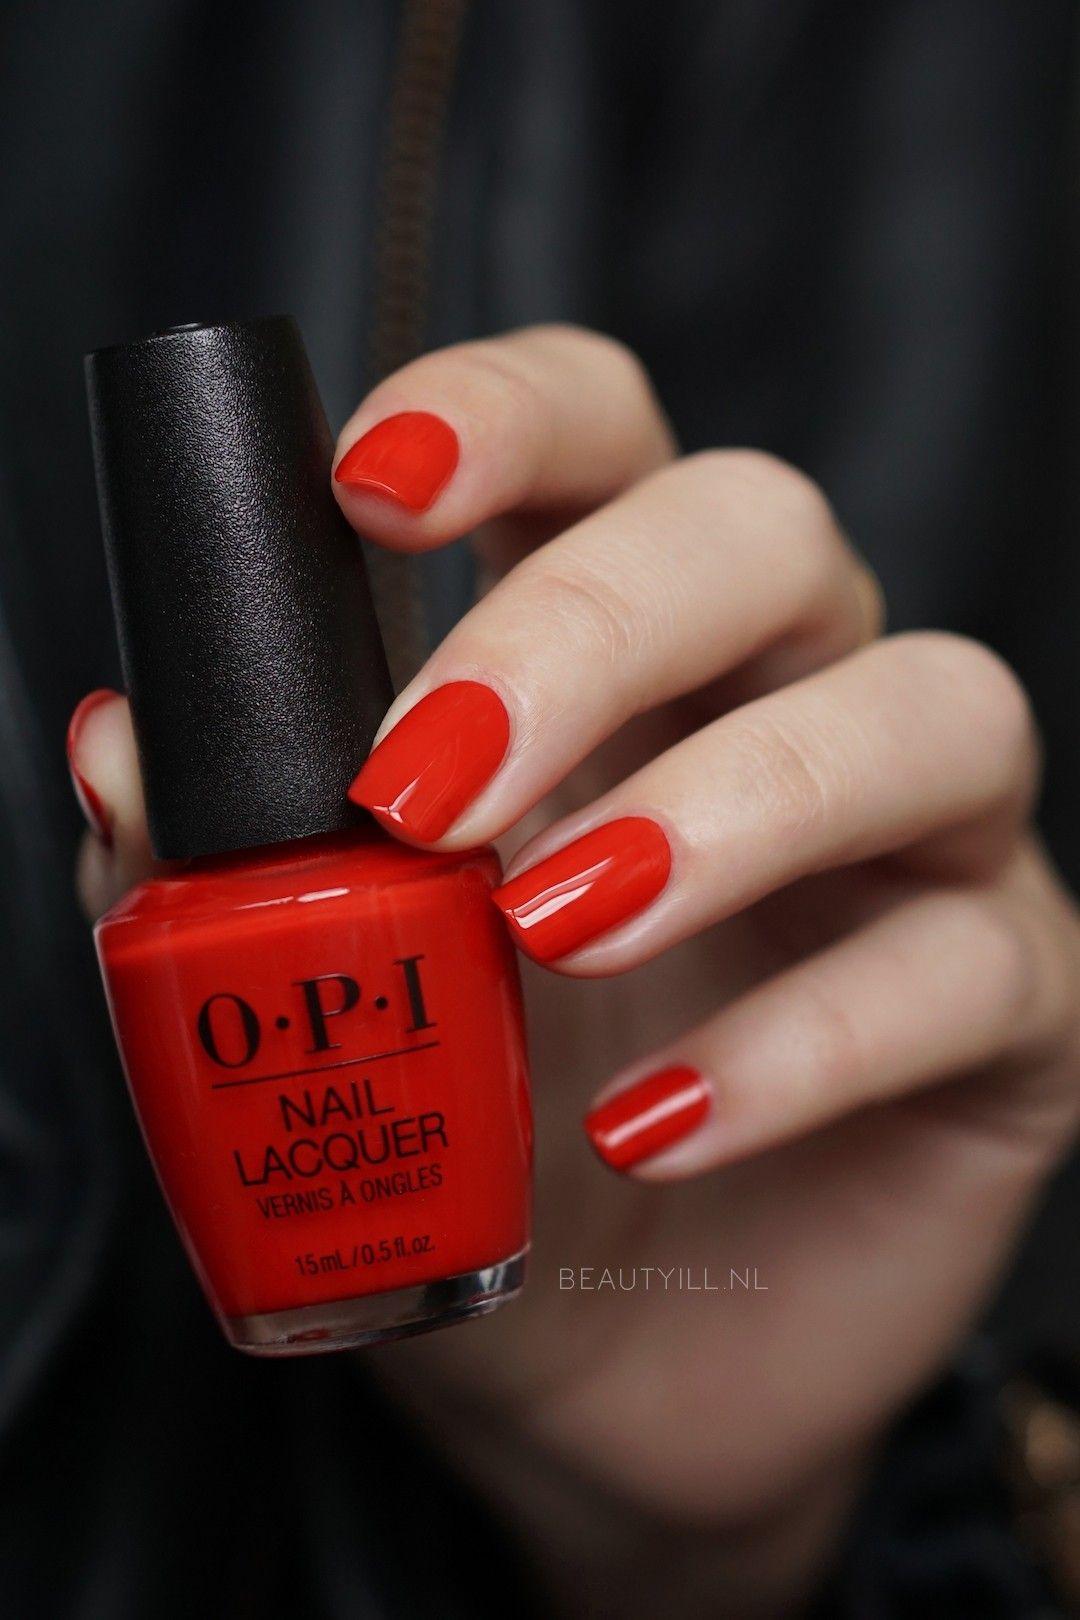 OPI My Wish List is You | uñas | Pinterest | OPI, Nail polish colors ...